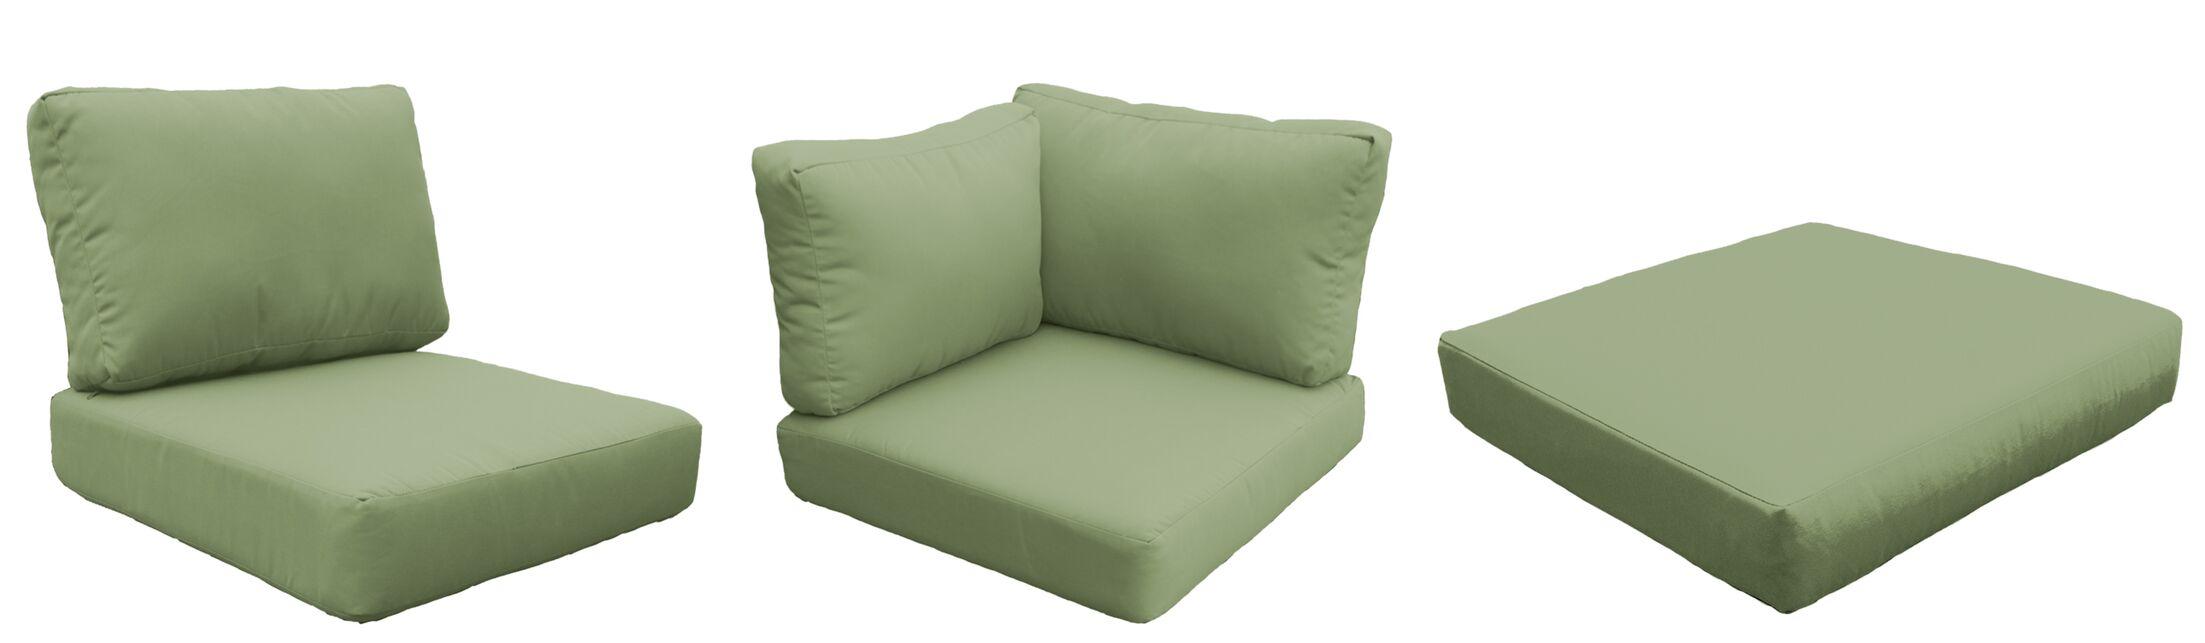 East Village 9 Outdoor Cushion Set Fabric: Cilantro